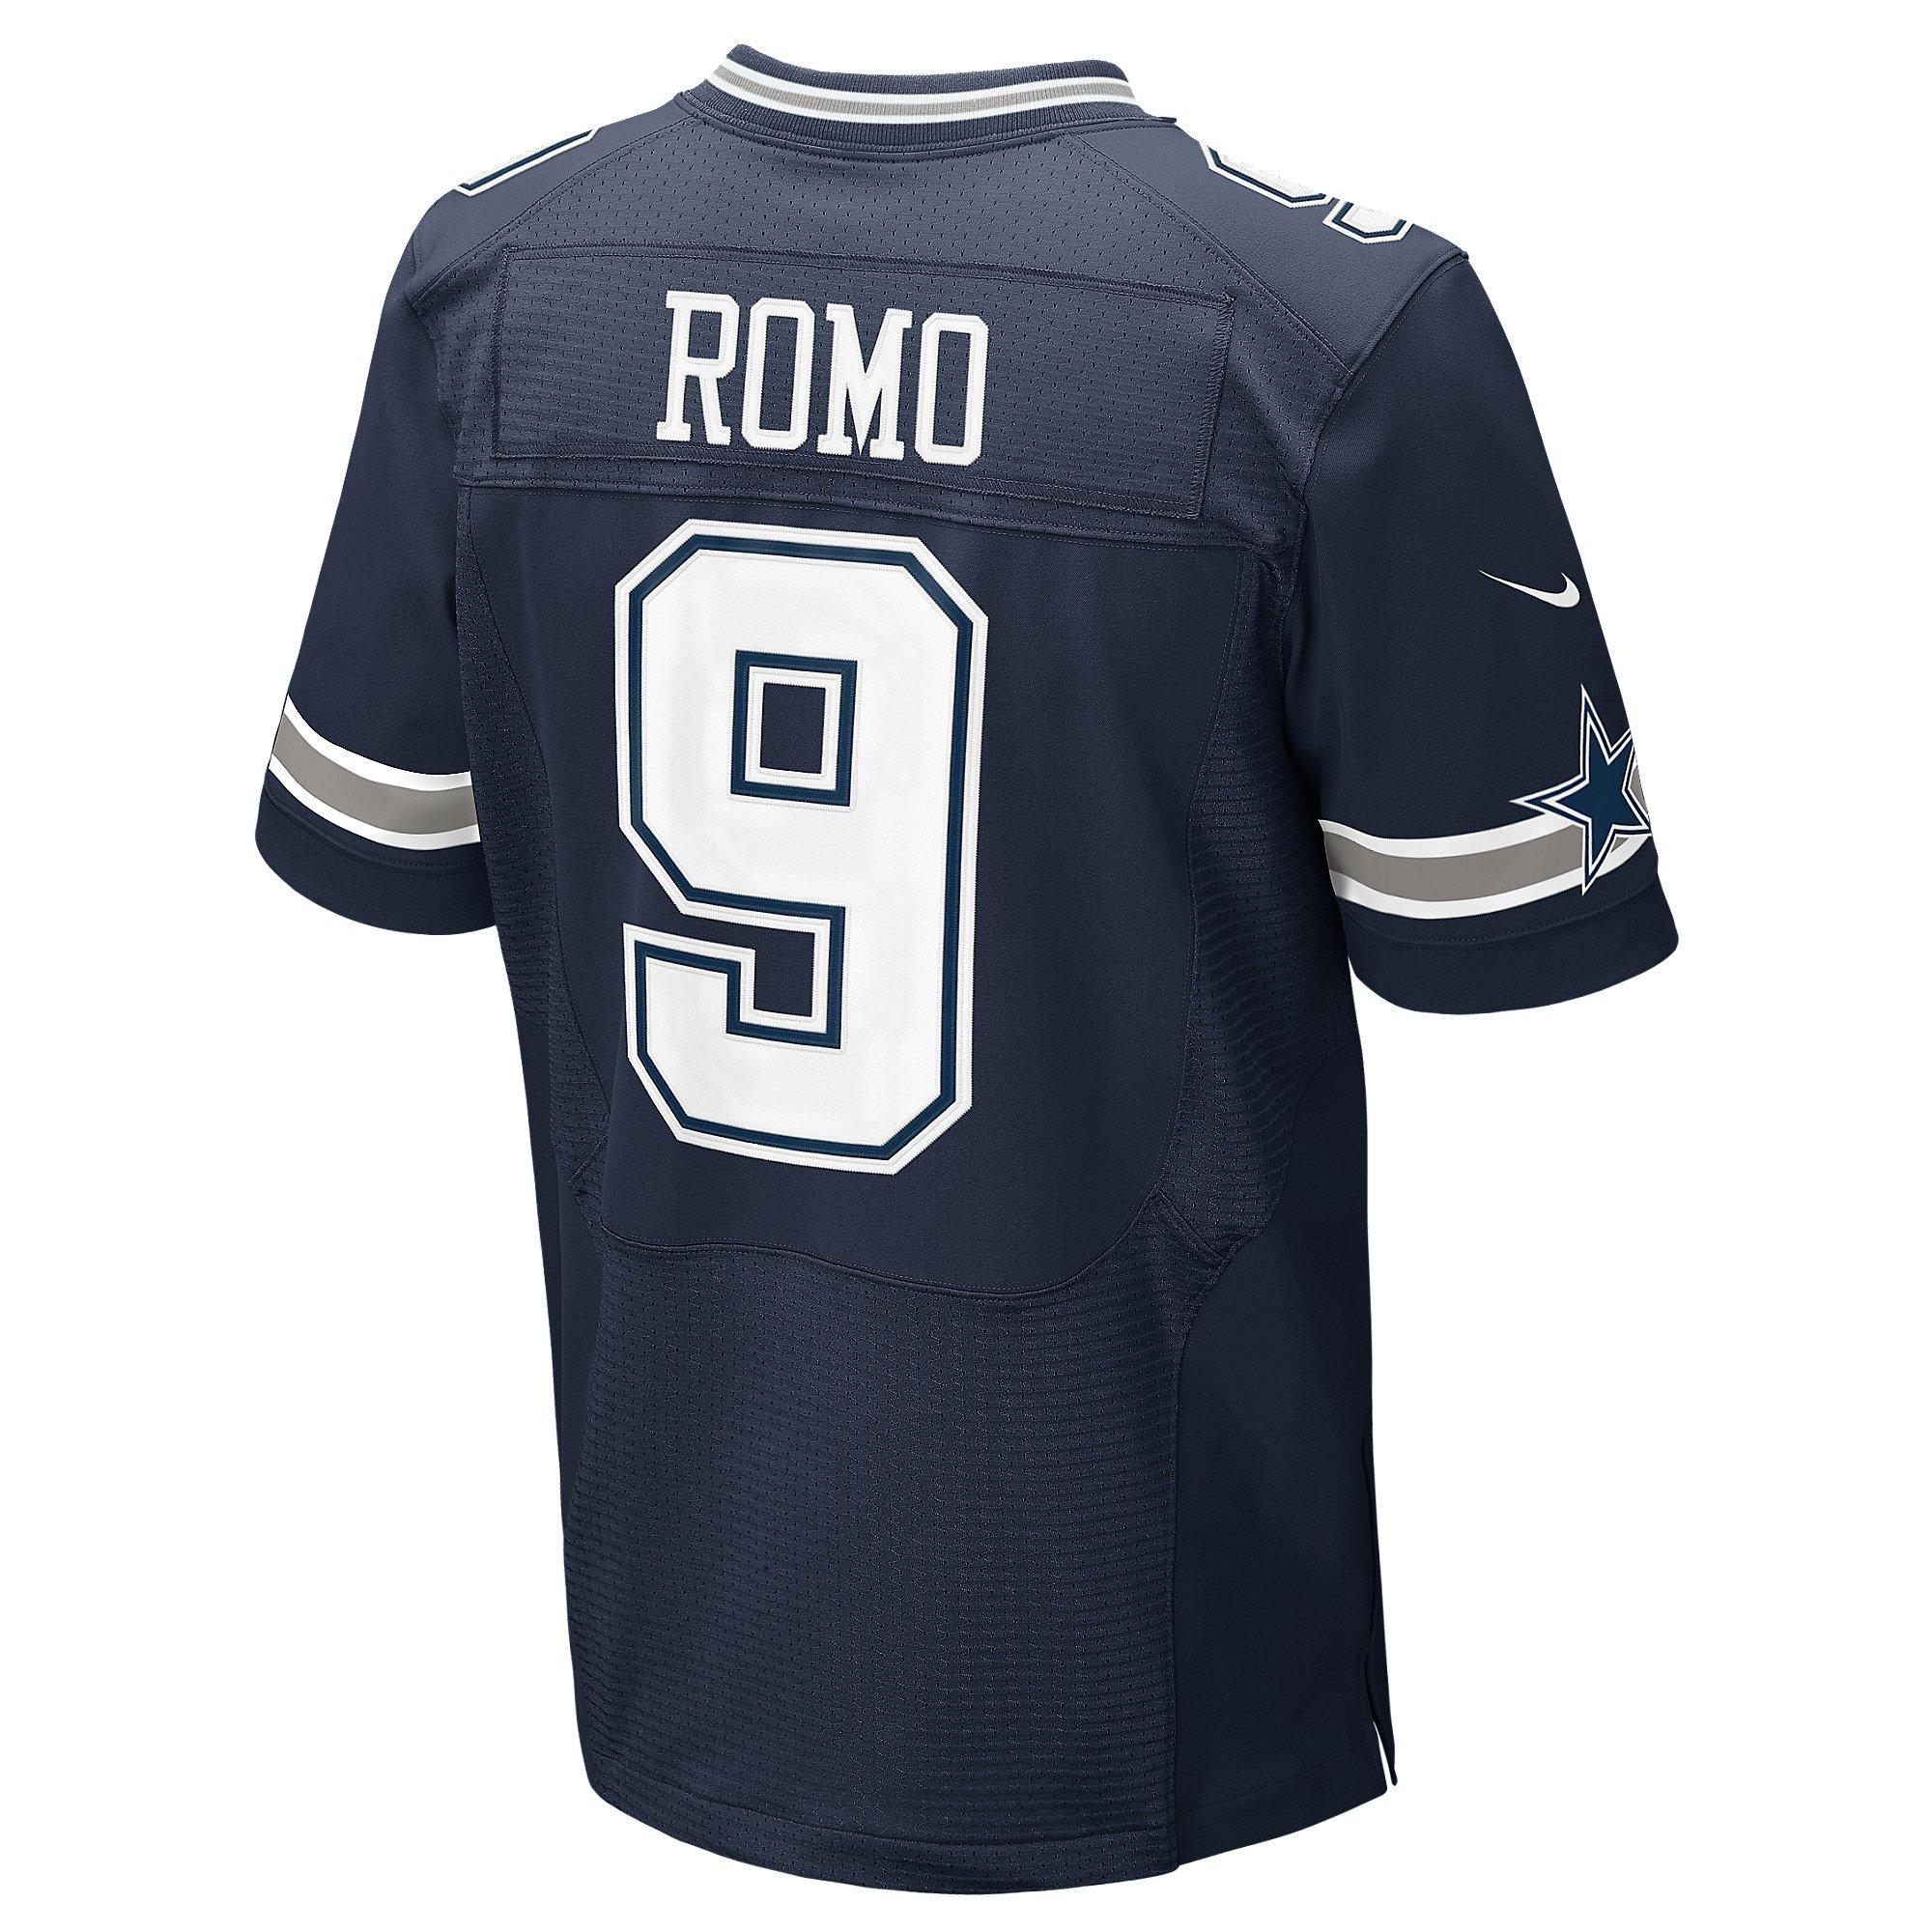 Dallas Cowboys Tony Romo #9 Nike Elite Authentic Jersey | Dallas ...